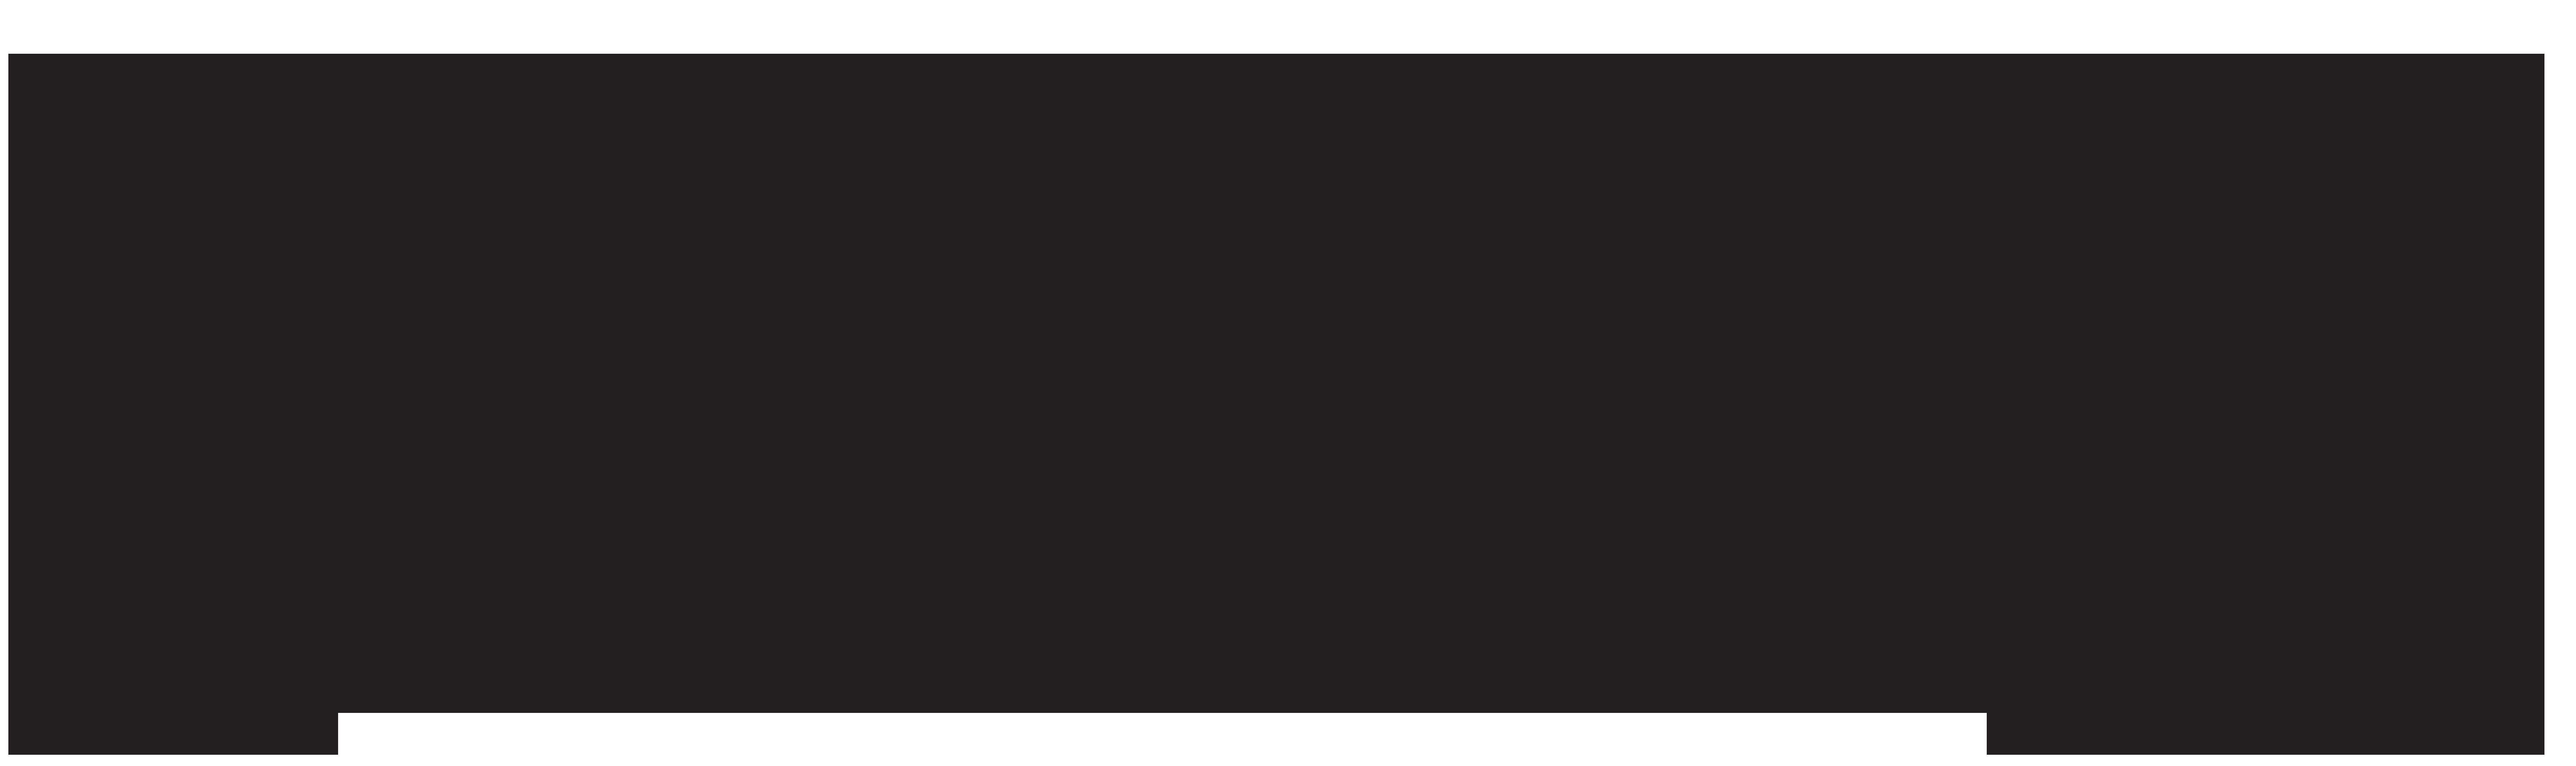 Camel Silhouette Clip Art at GetDrawings.com.